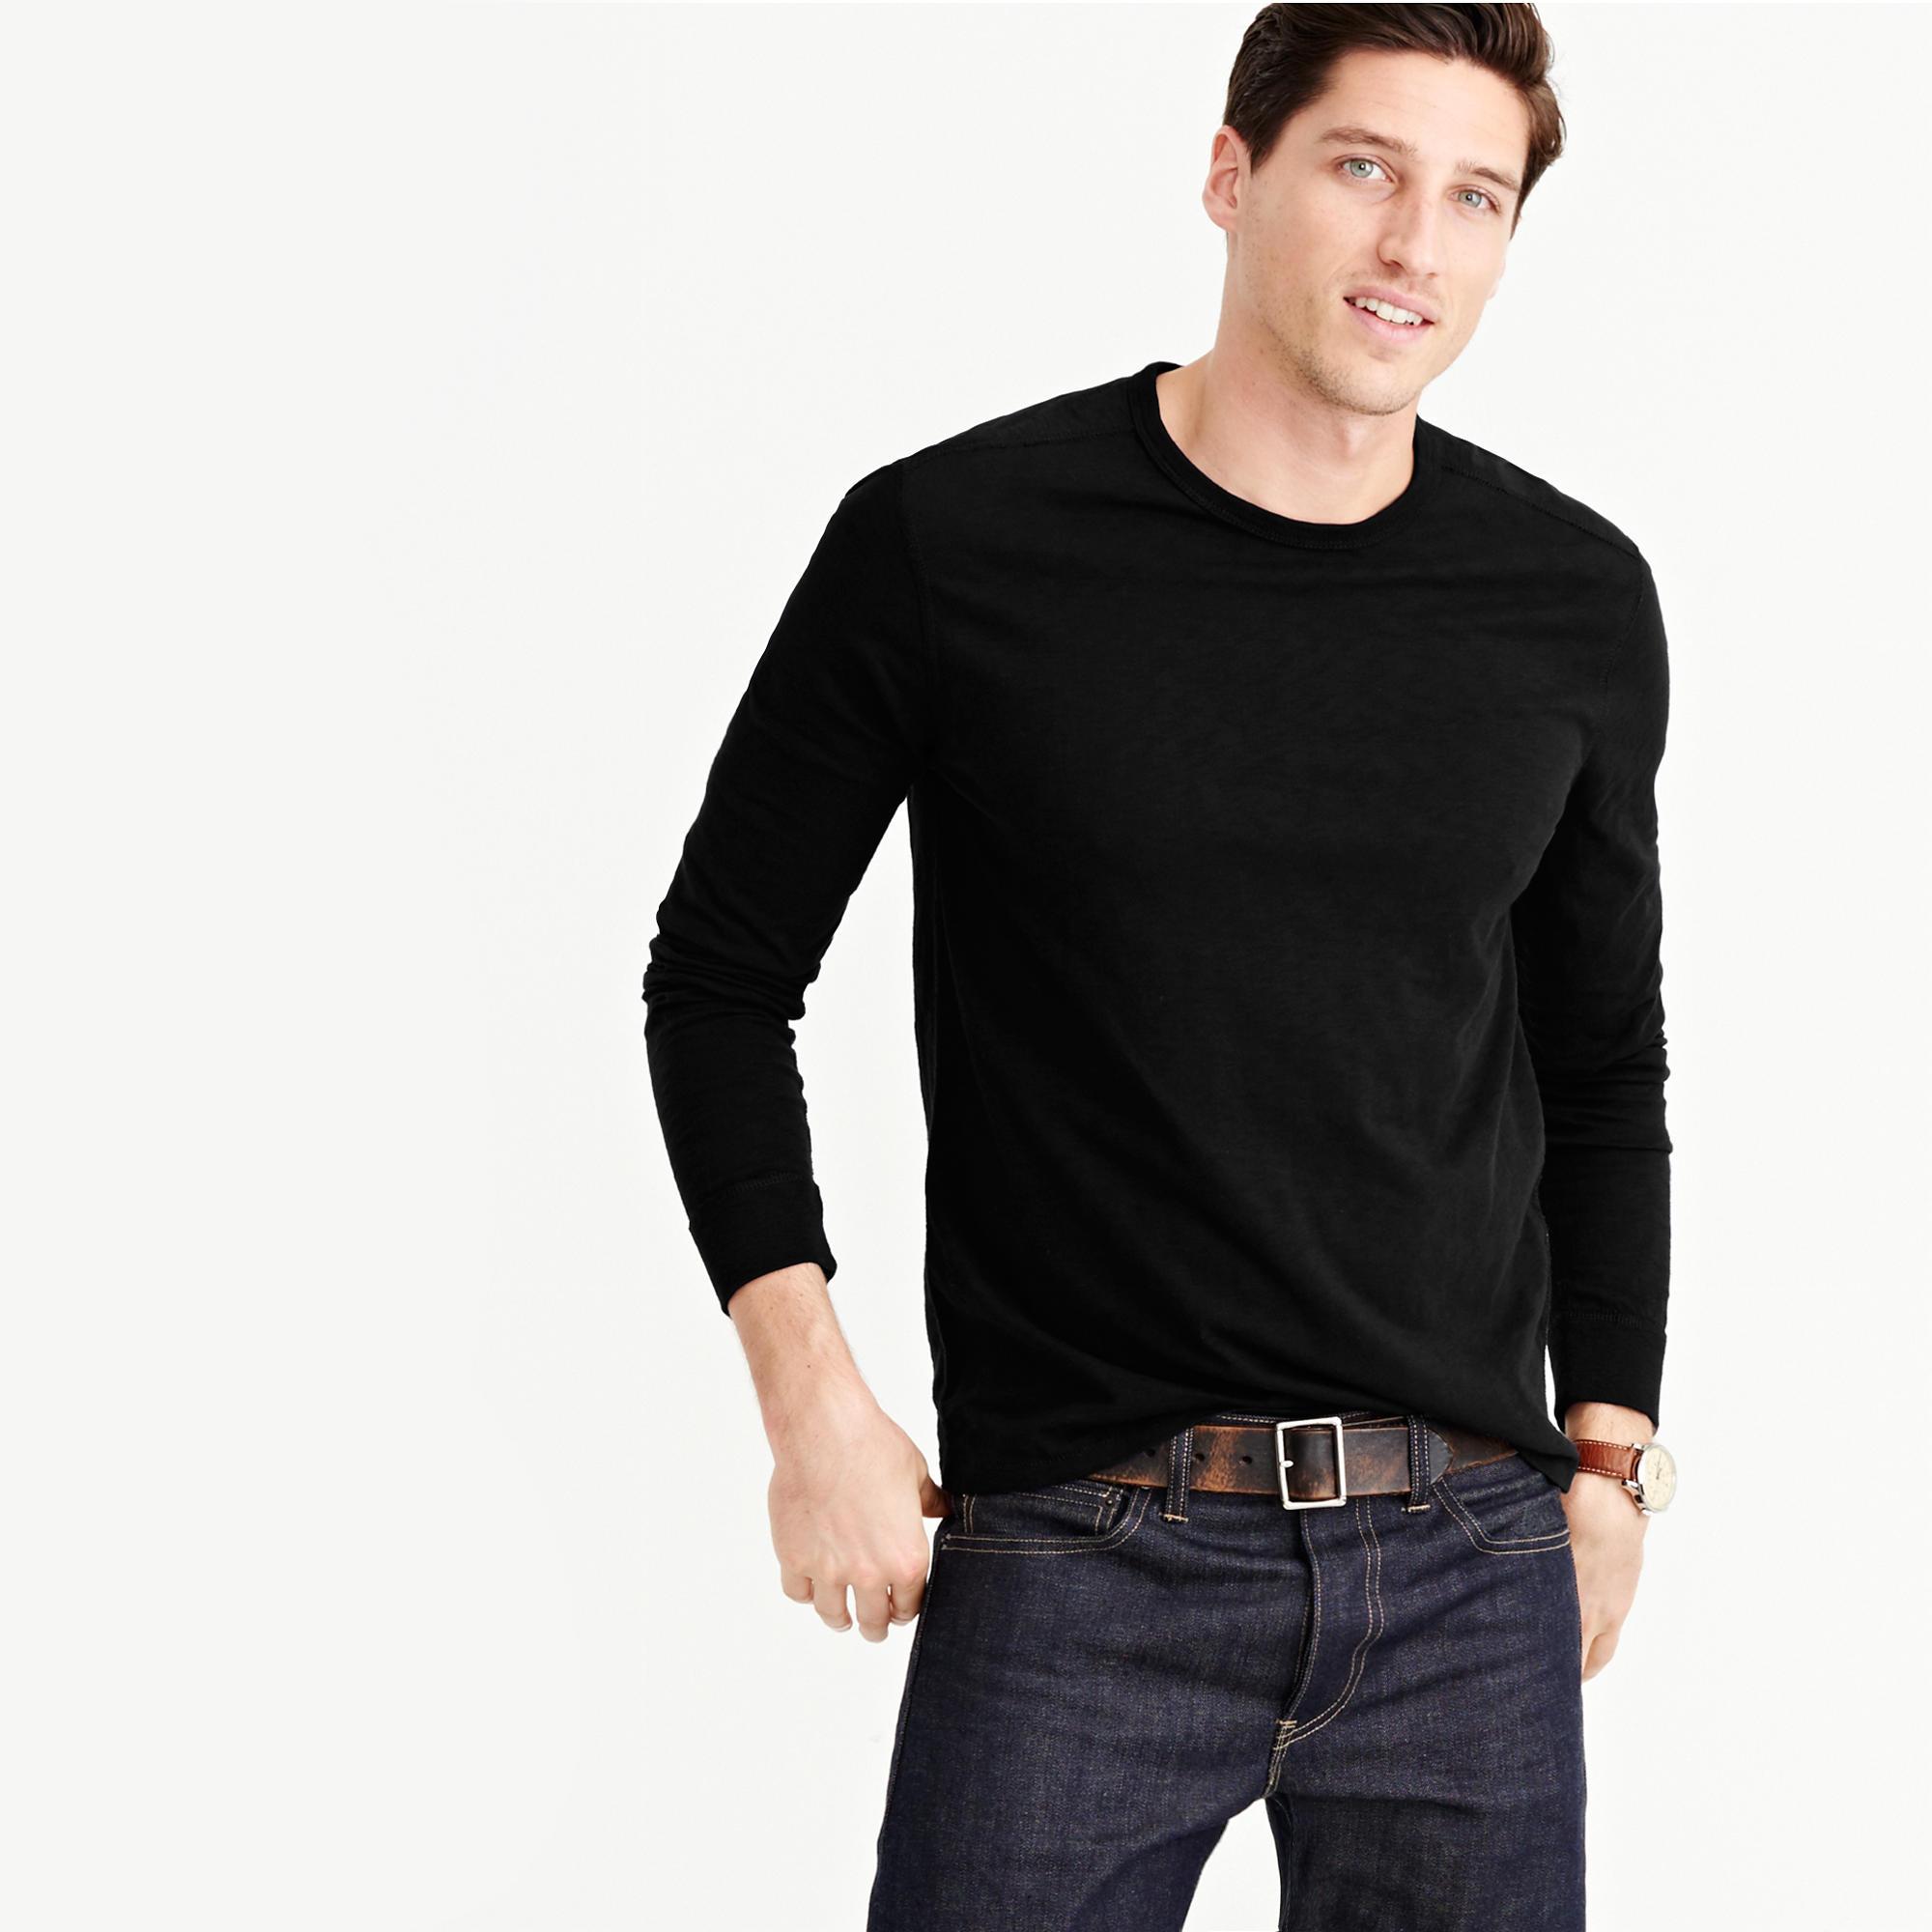 J.crew Men's Long-sleeve Textured Cotton T-shirt